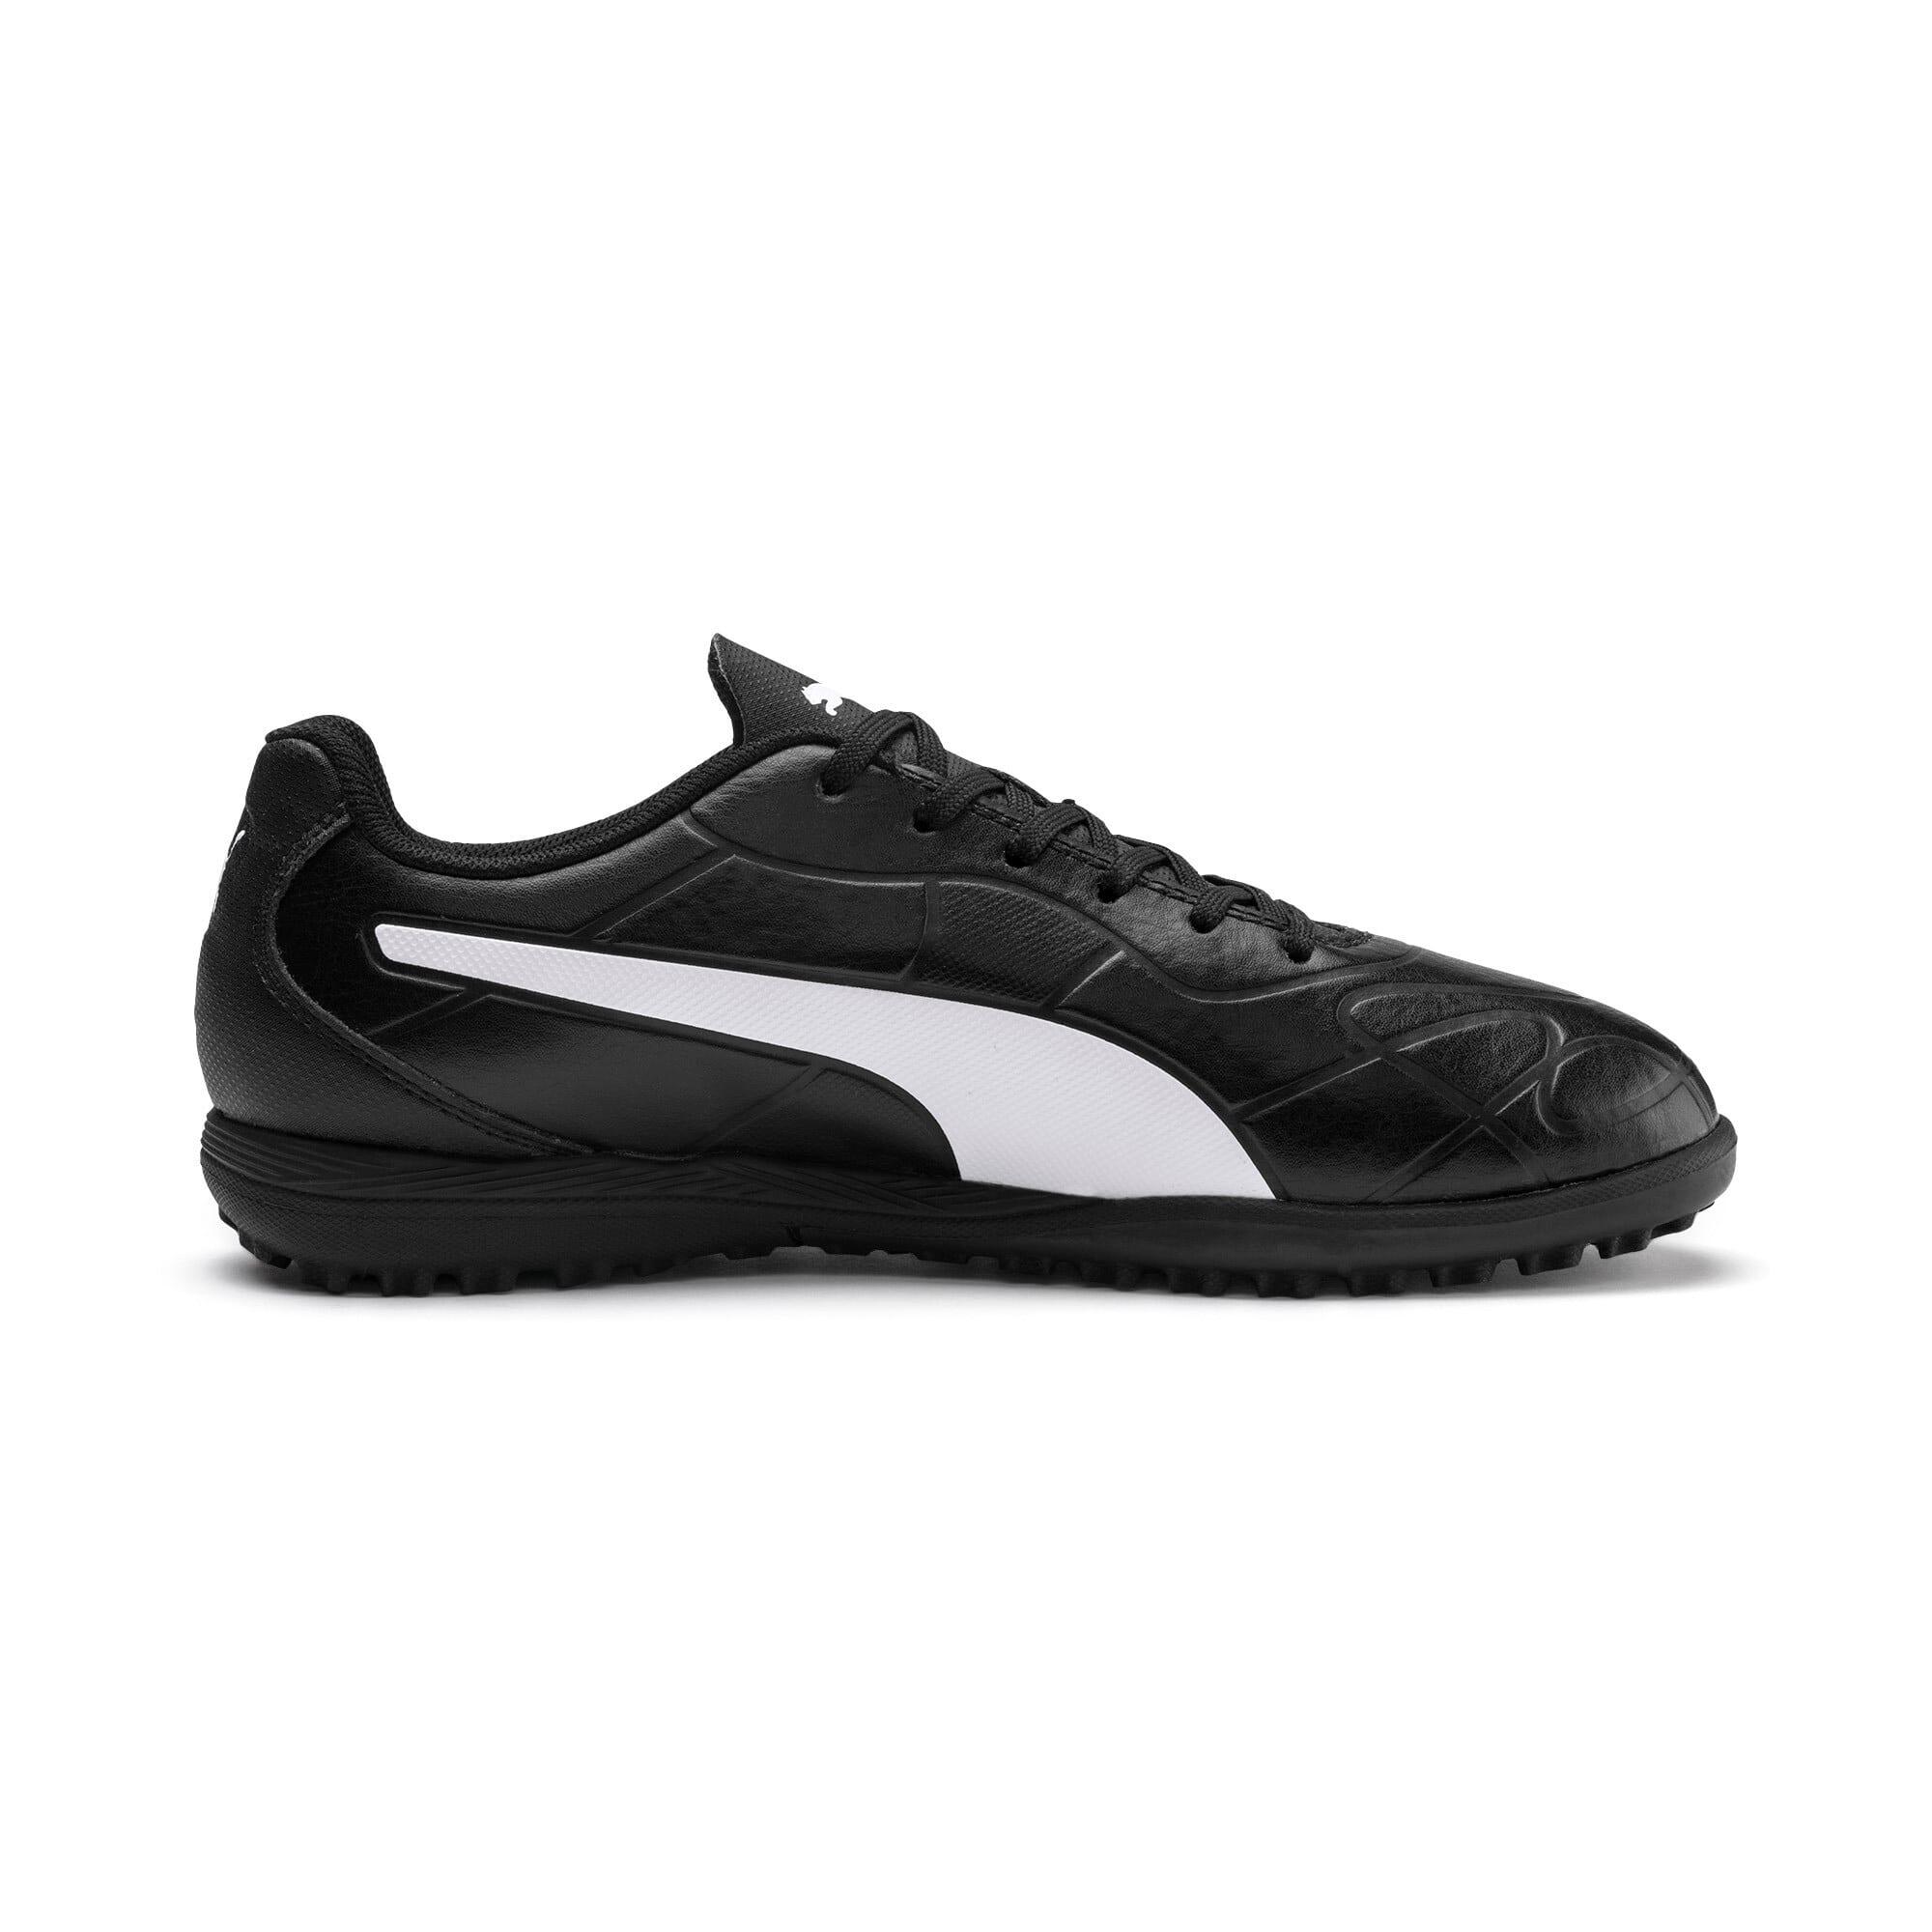 Thumbnail 5 of Monarch TT Youth Football Boots, Puma Black-Puma White, medium